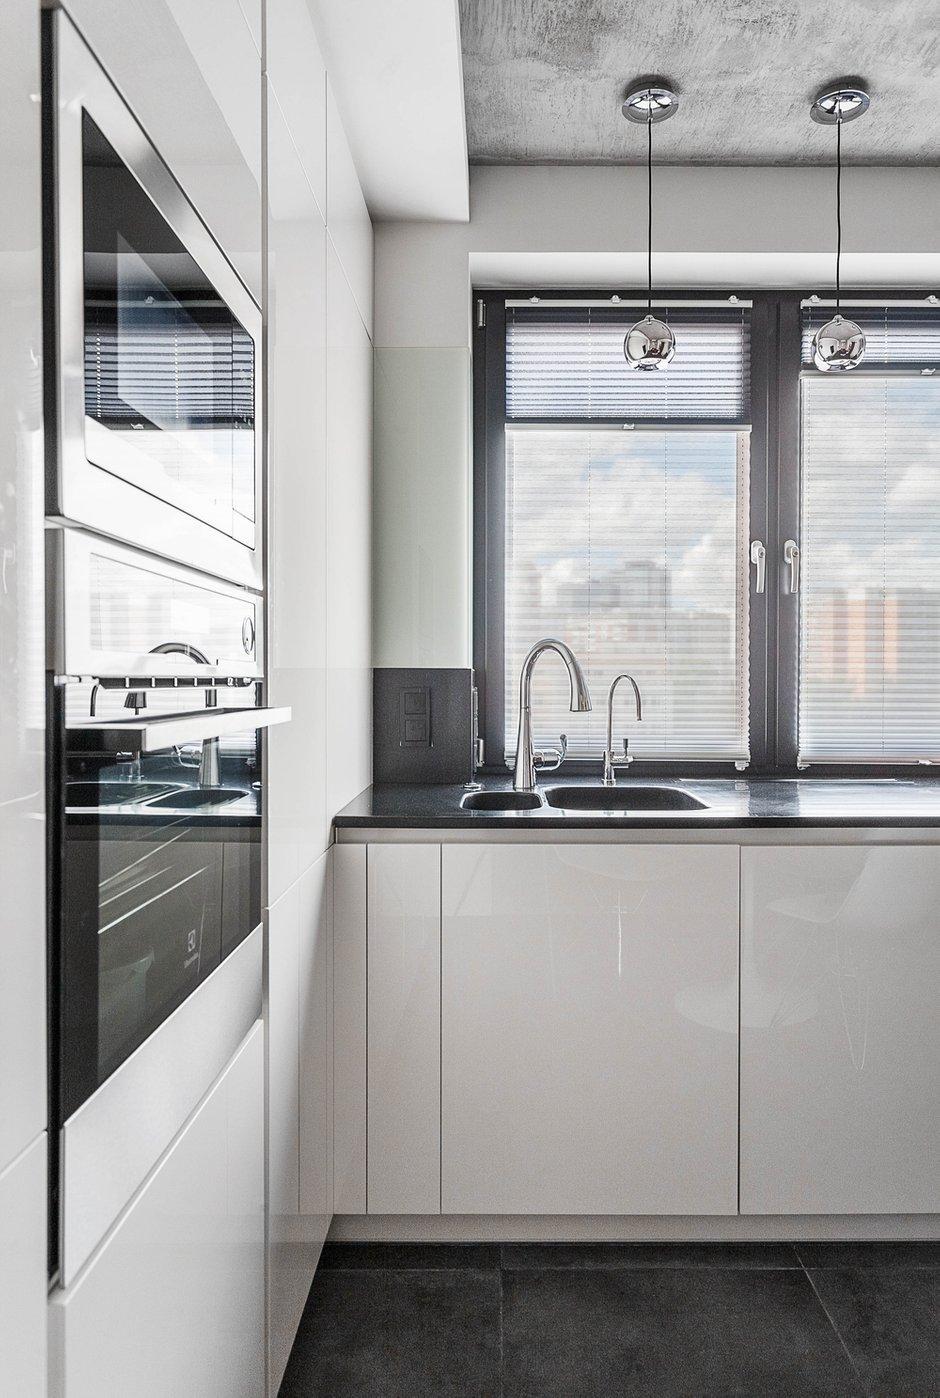 Фотография: Кухня и столовая в стиле Минимализм, Квартира, Проект недели, Москва, ИКЕА, Мила Титова, П44т – фото на INMYROOM